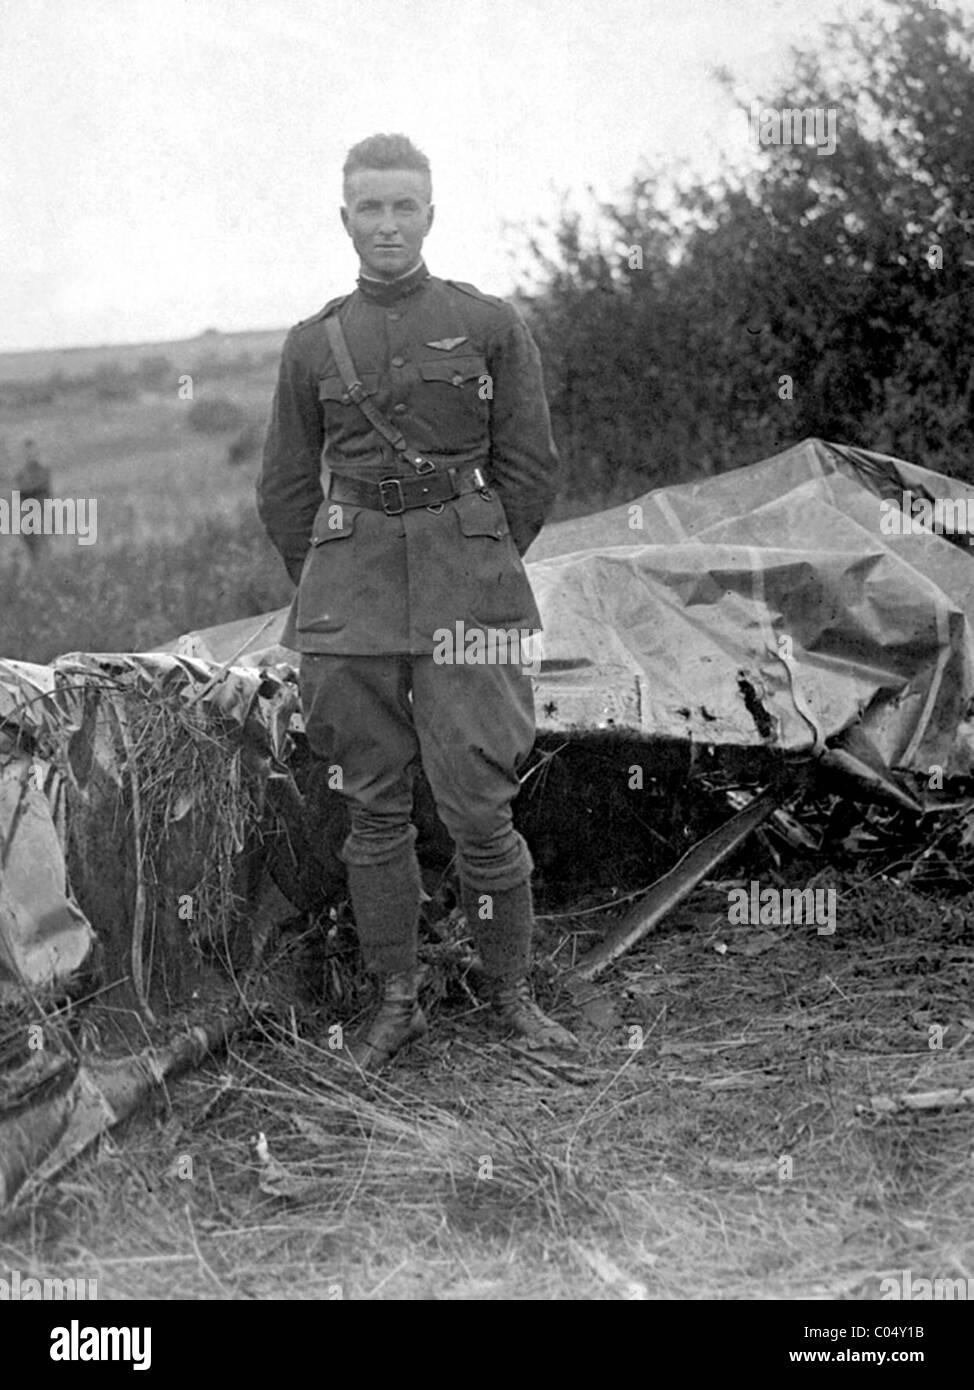 Lt. Frank Luke was an American fighter ace in World War I - Stock Image